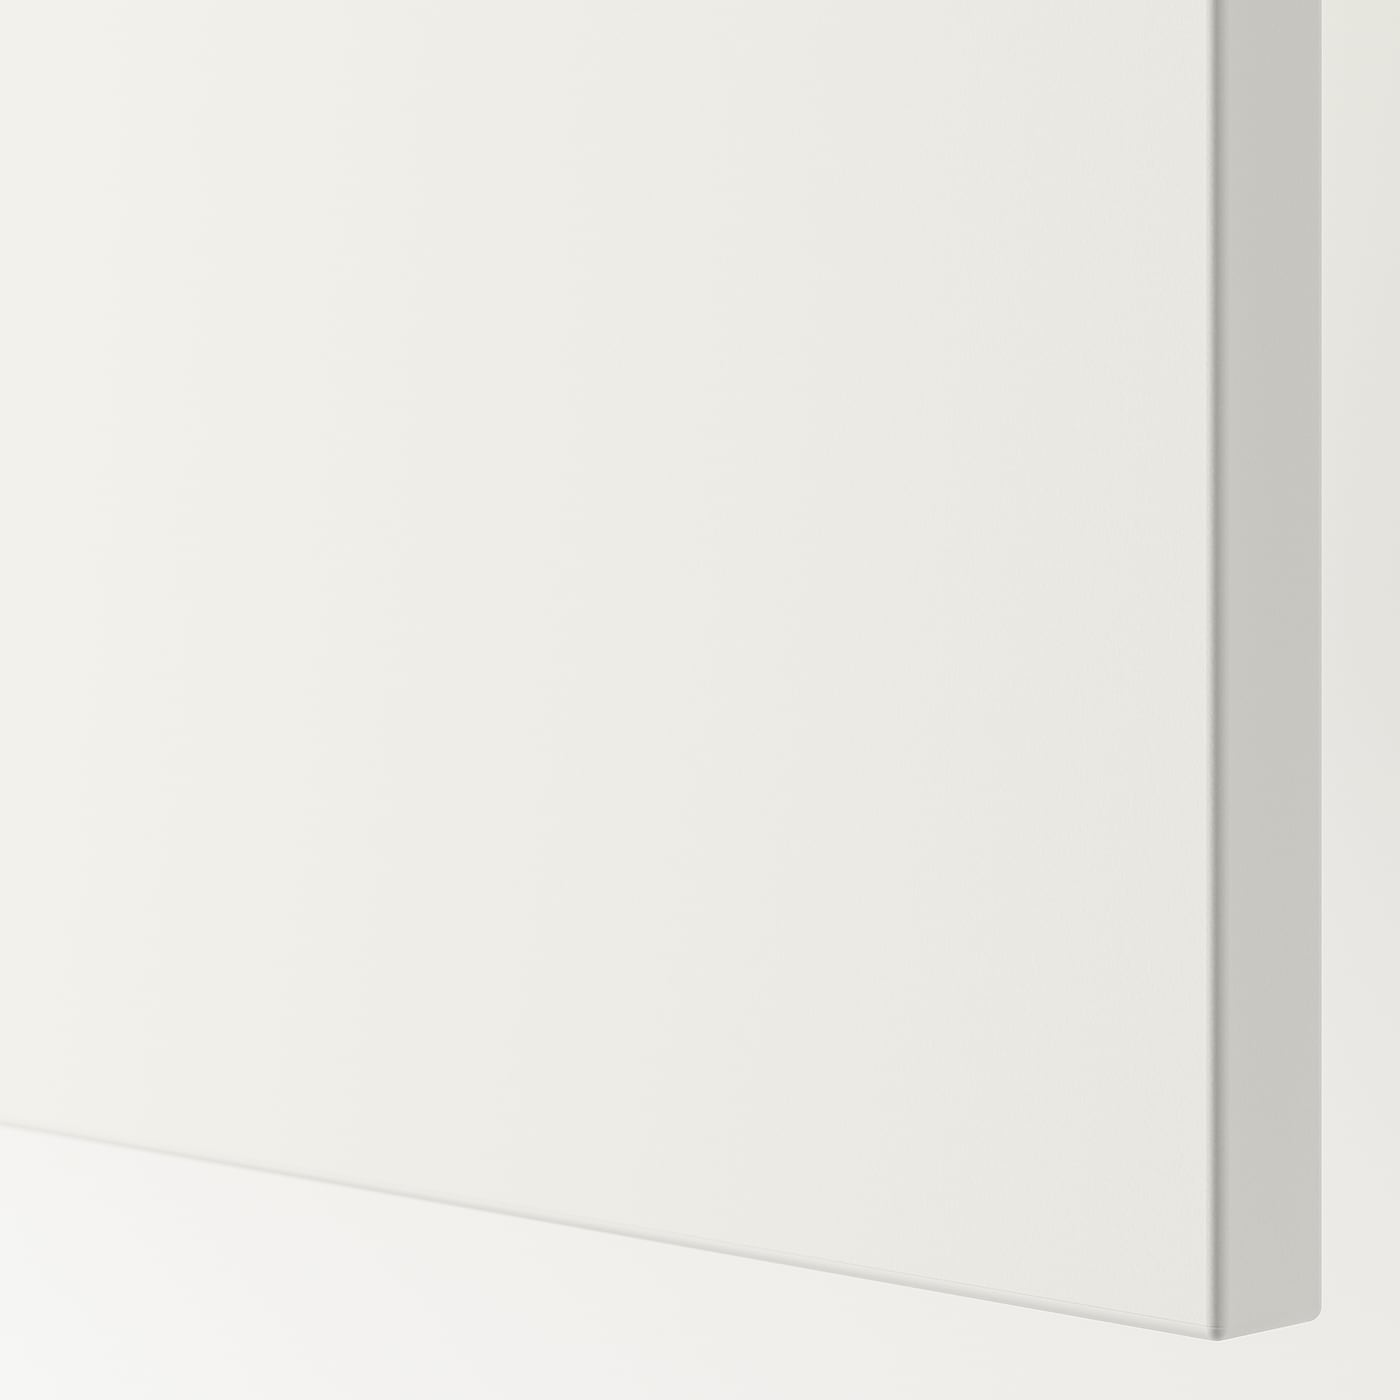 FONNES Tür, weiß, 40x120 cm